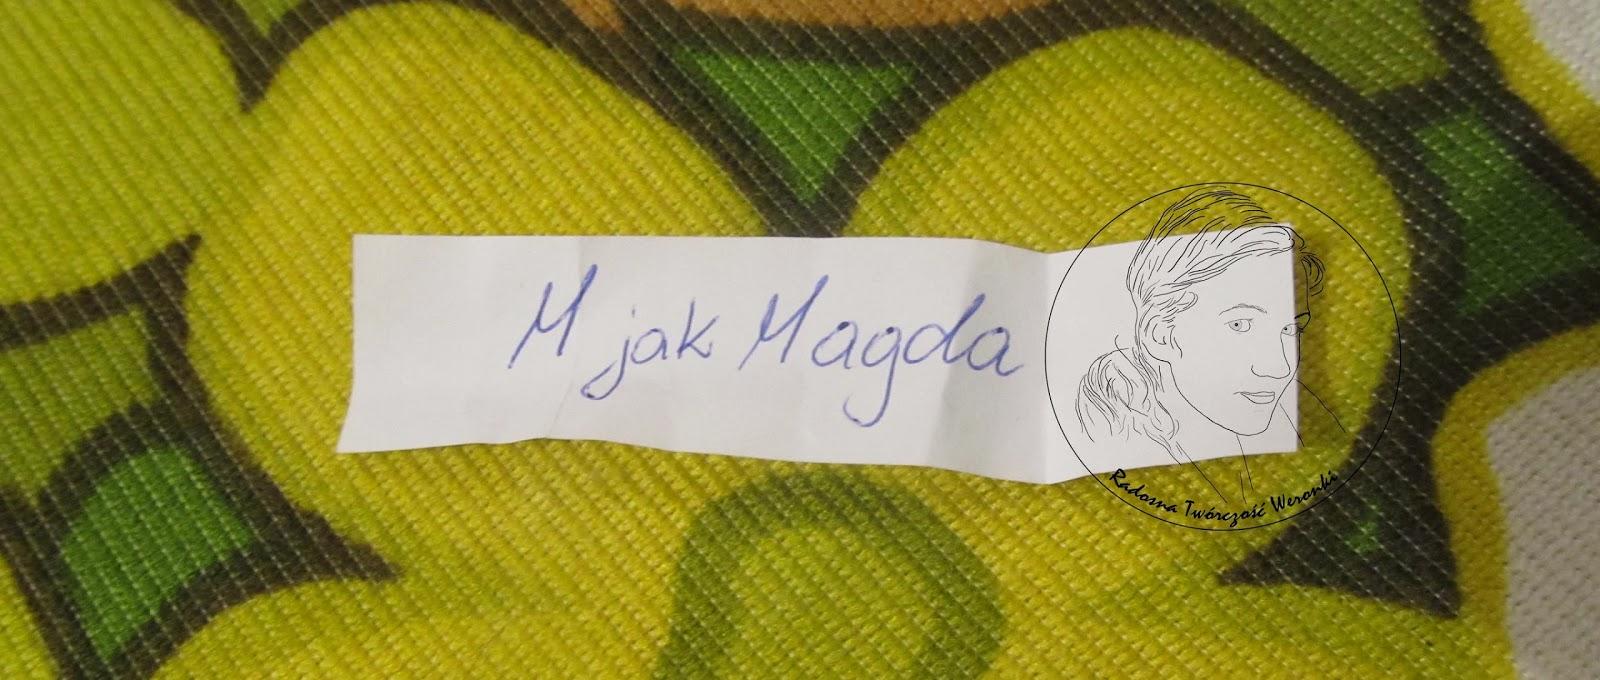 http://mjakmagda.blogspot.com/